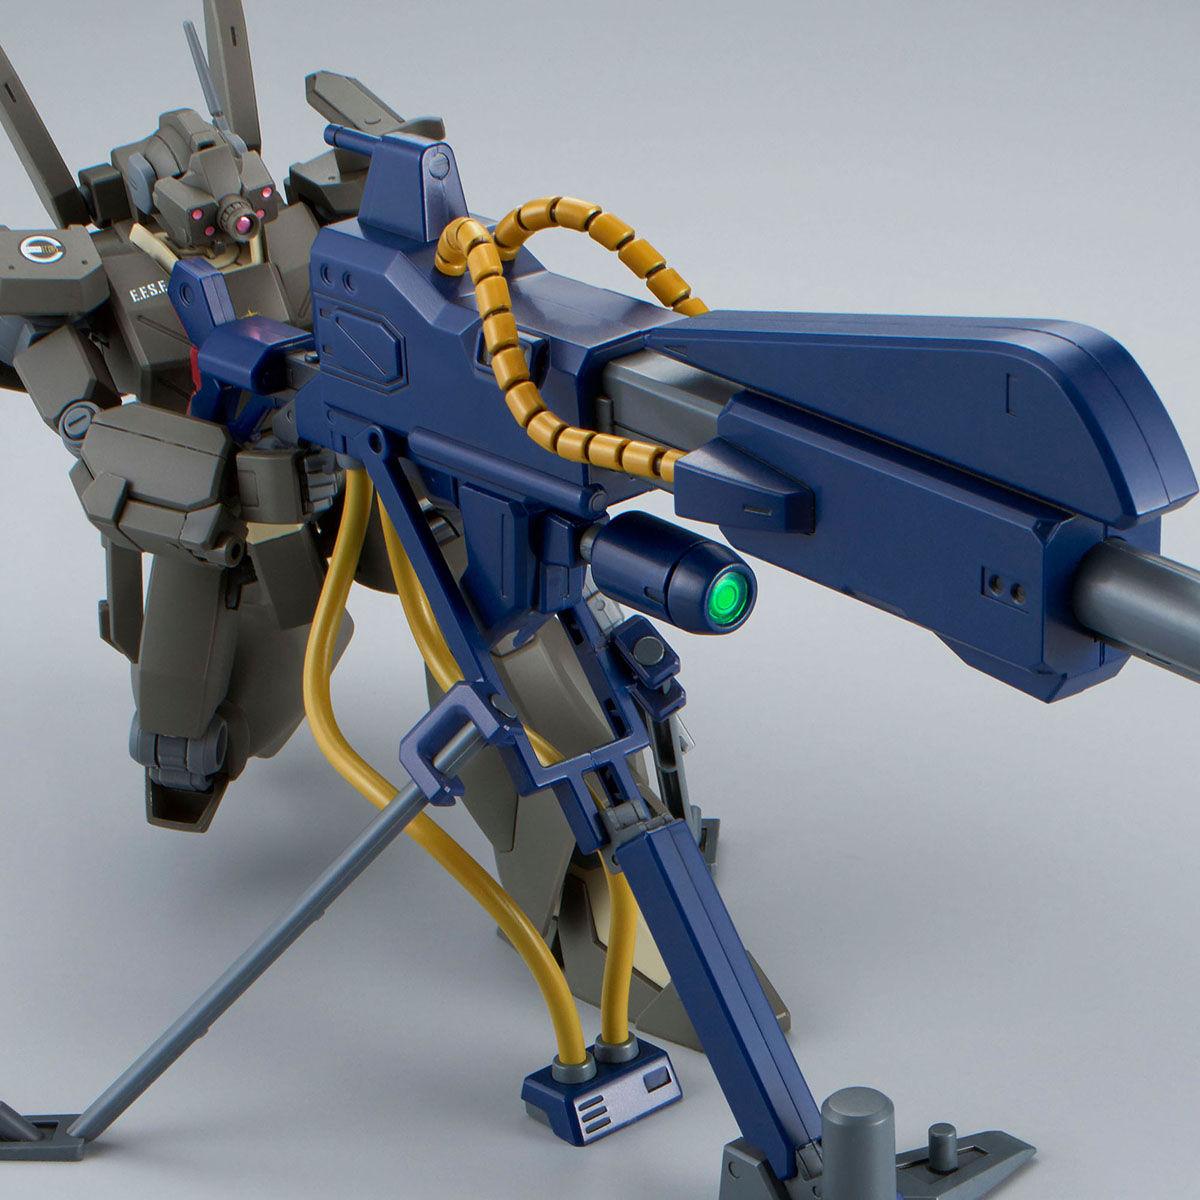 HG 1/144《機動戰士鋼彈UC》FHA-02MI MEGA火箭巨砲(康洛依機用)|メガ・バズーカ・ランチャー(コンロイ機用)【PB限定】